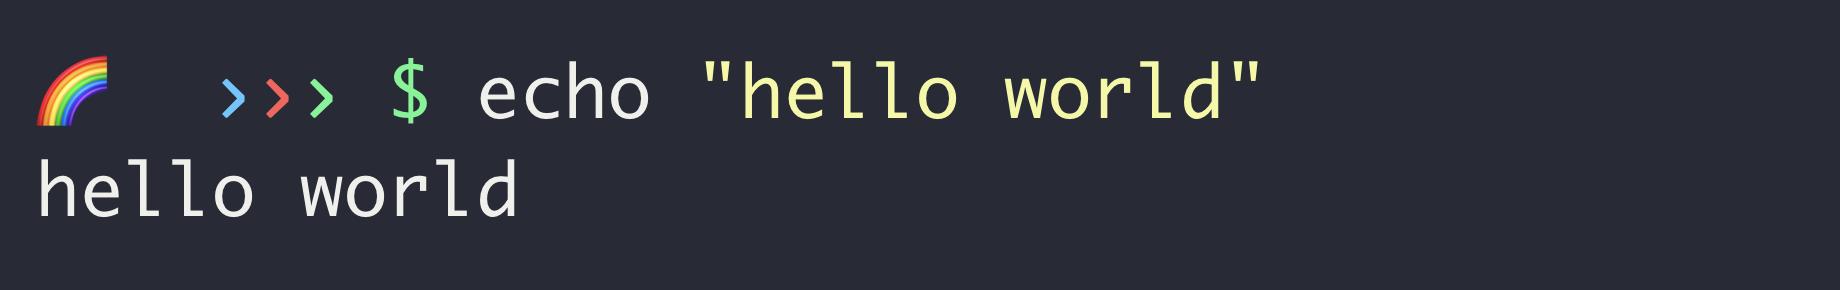 "Terminal command: $ echo ""hello world"""